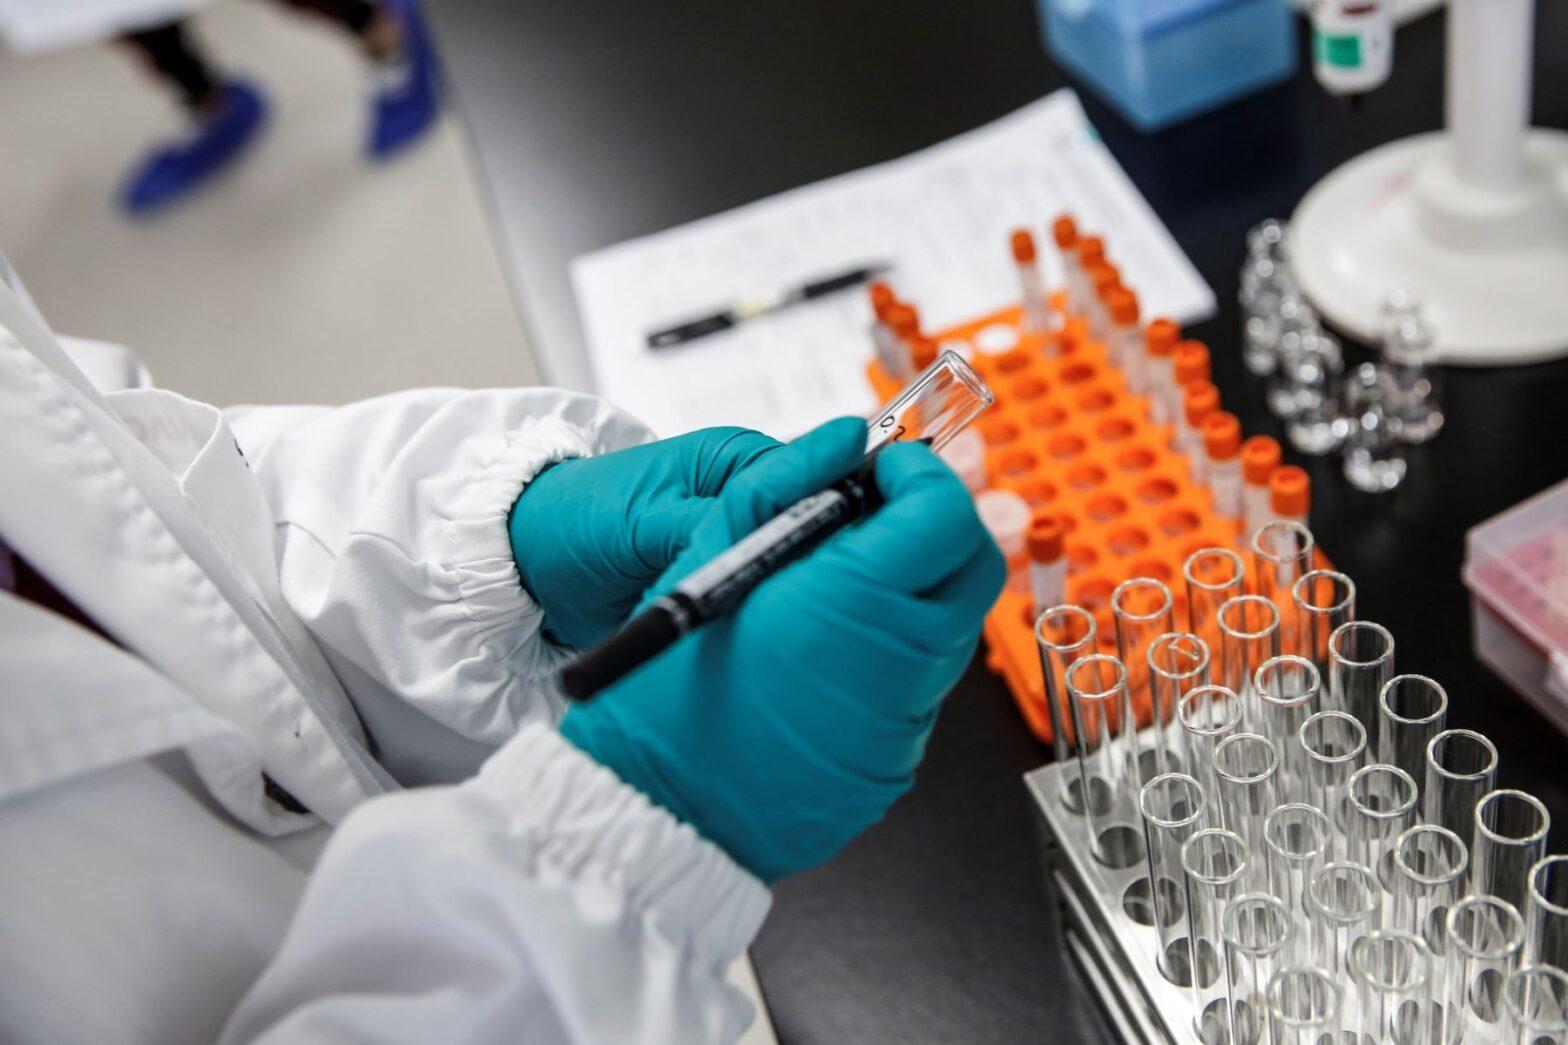 Laboratorio chino Sinovac prevé aplicar su vacuna masivamente a principios de 2021